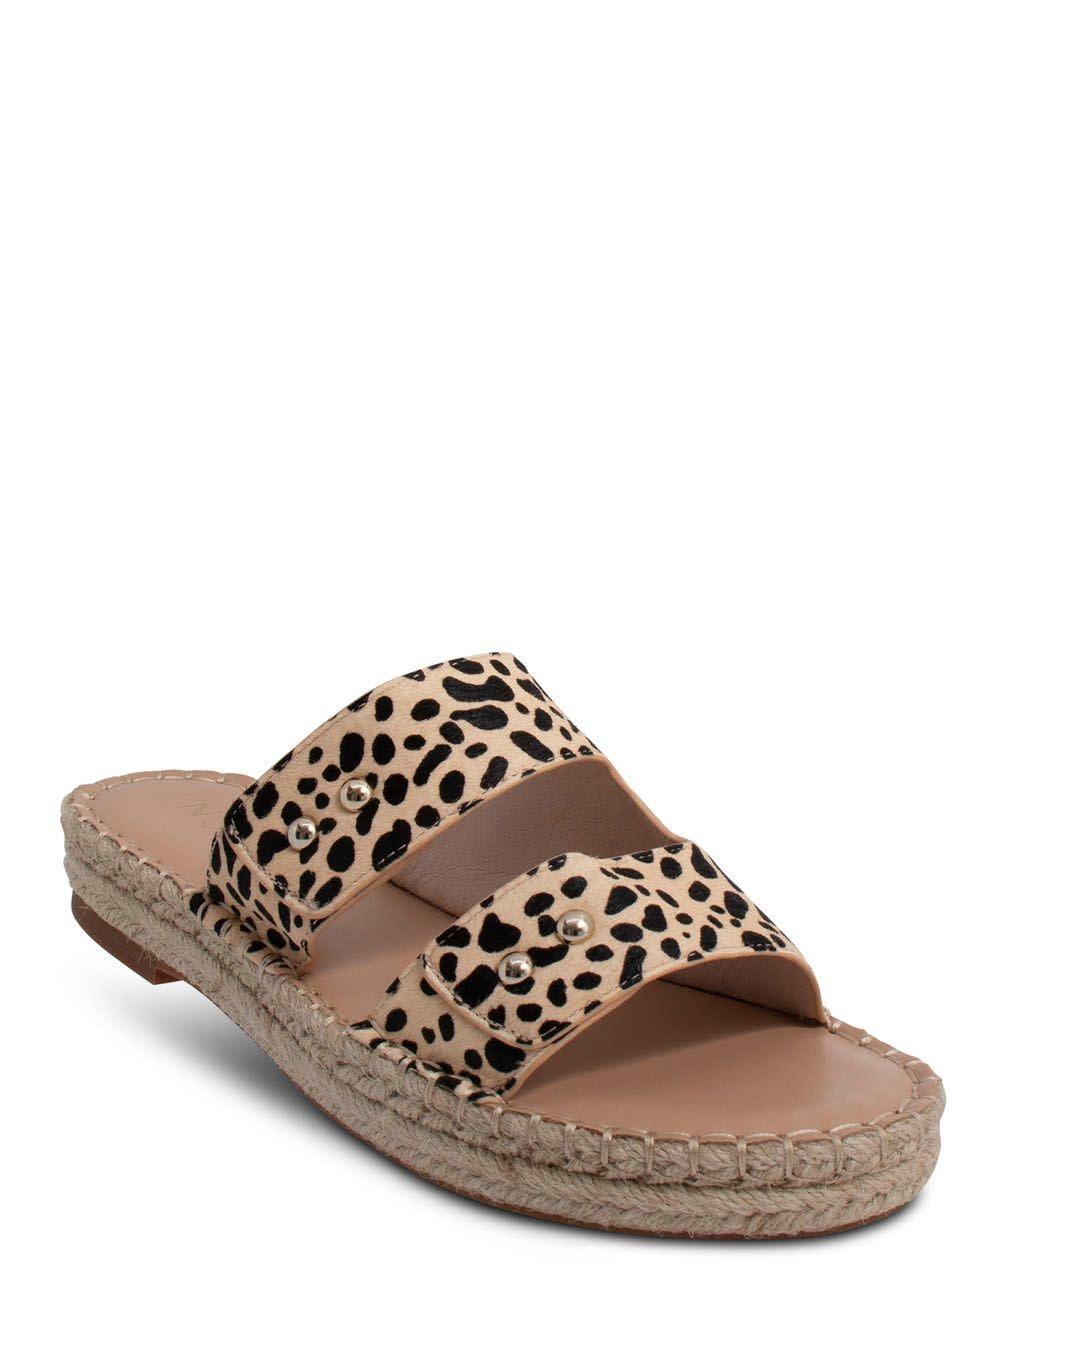 Nude Shoes Nadia Slide